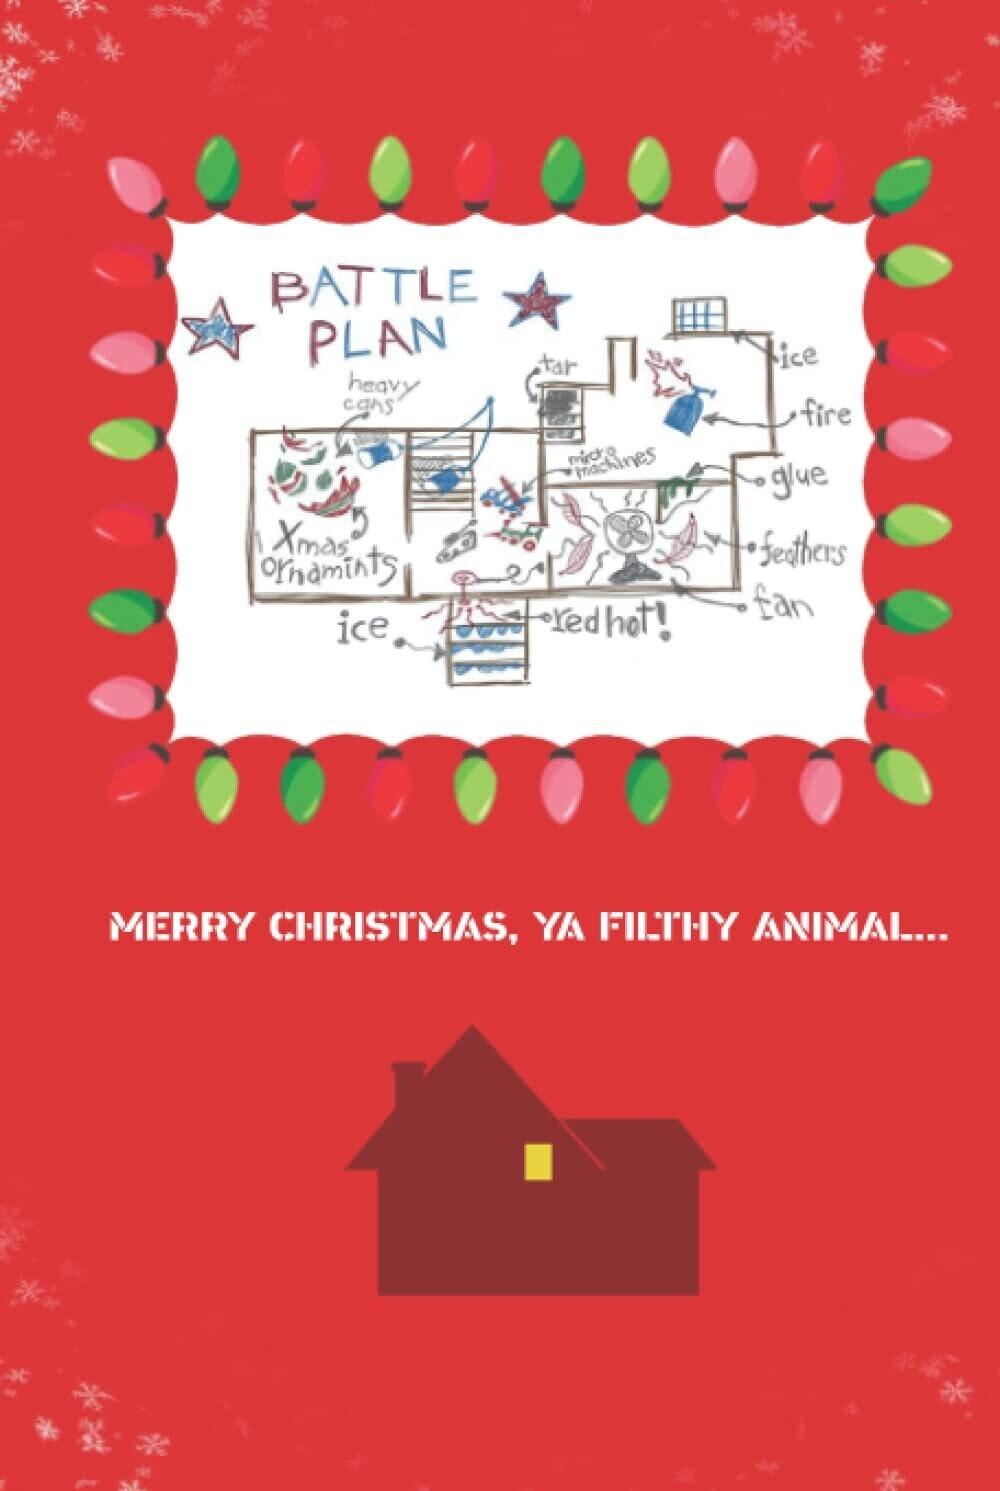 Home Alone Battle Plan [Hardback] Book - Christmas Movie Prop Journal Diary